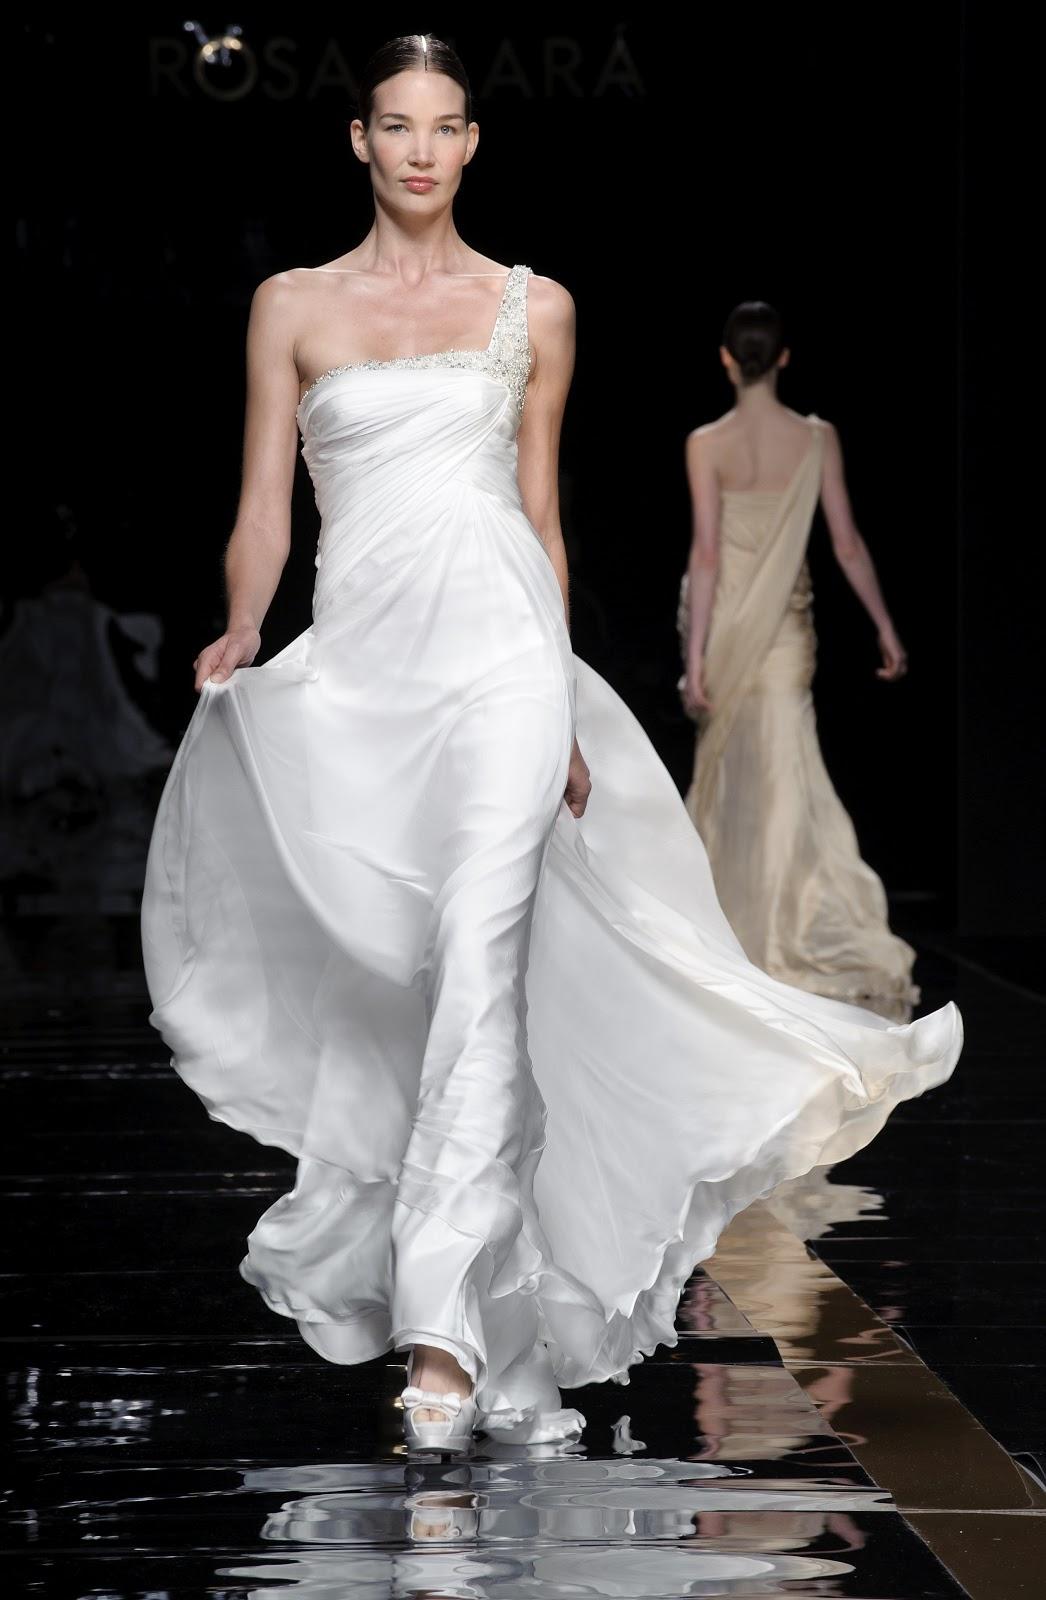 consignment wedding dresses atlanta photo - 1